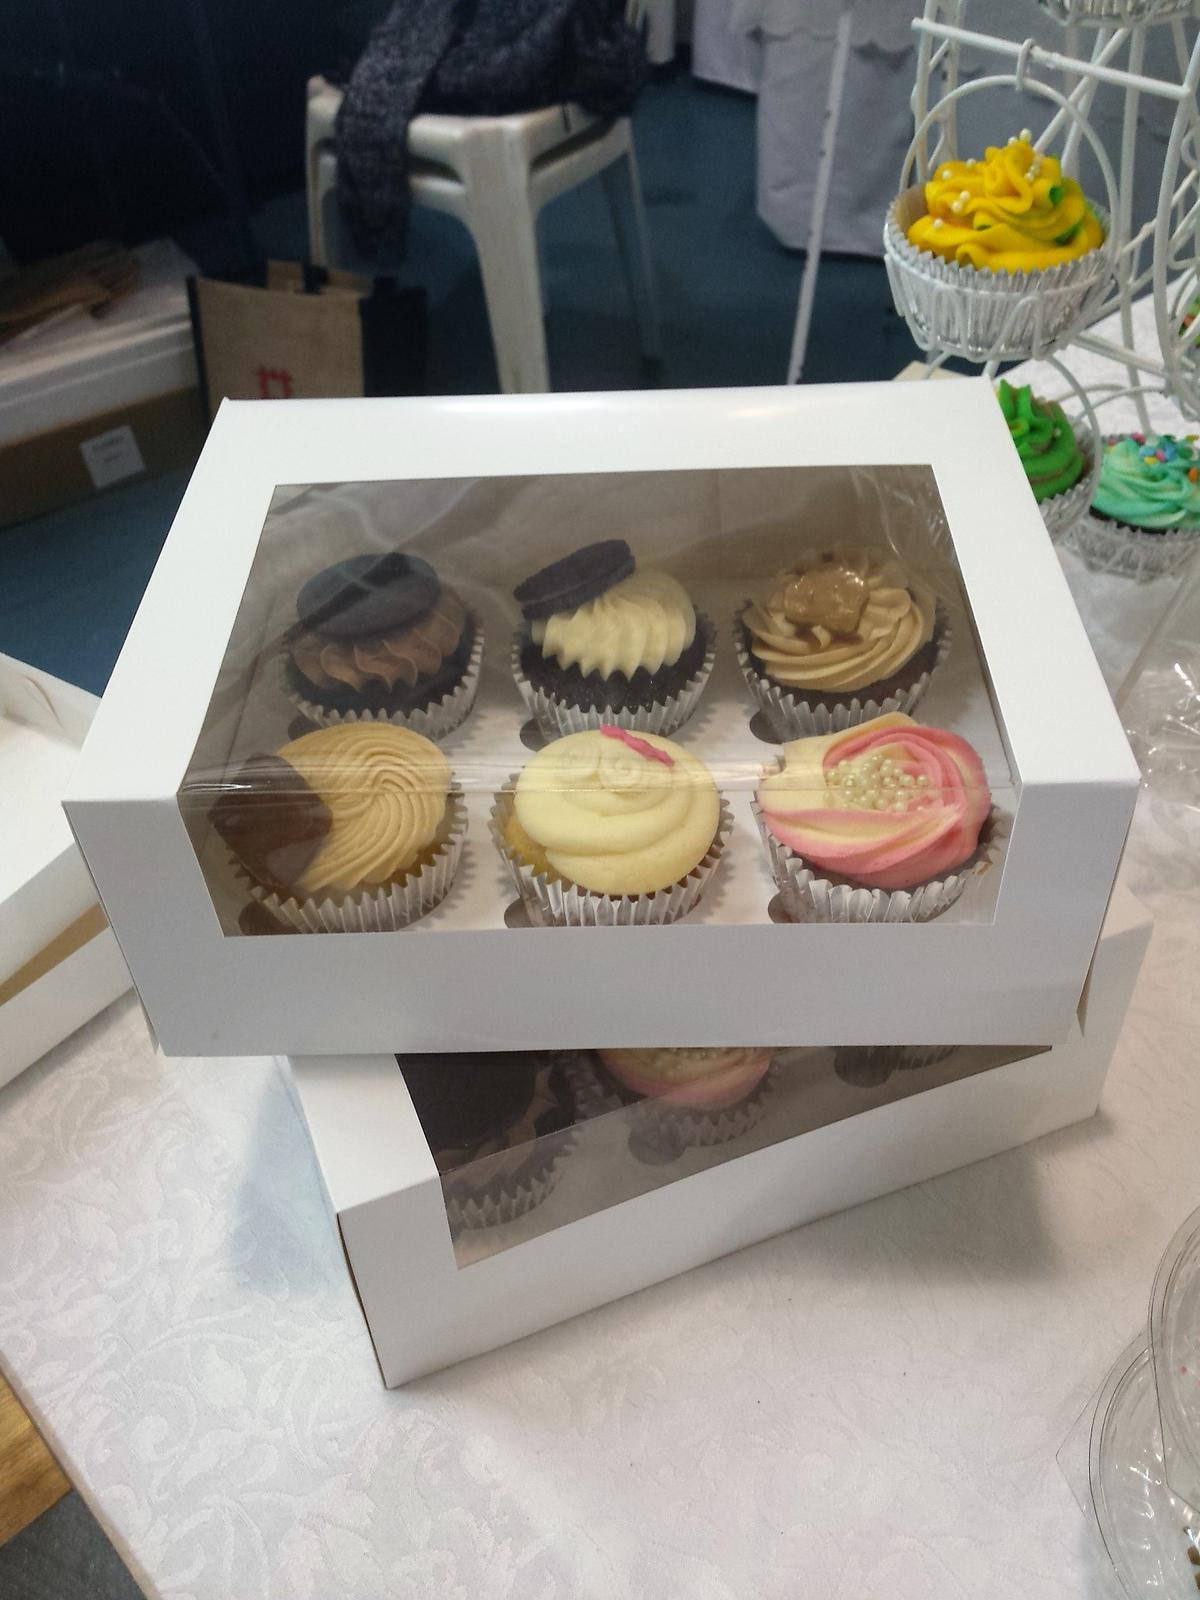 Varity of cupcakes